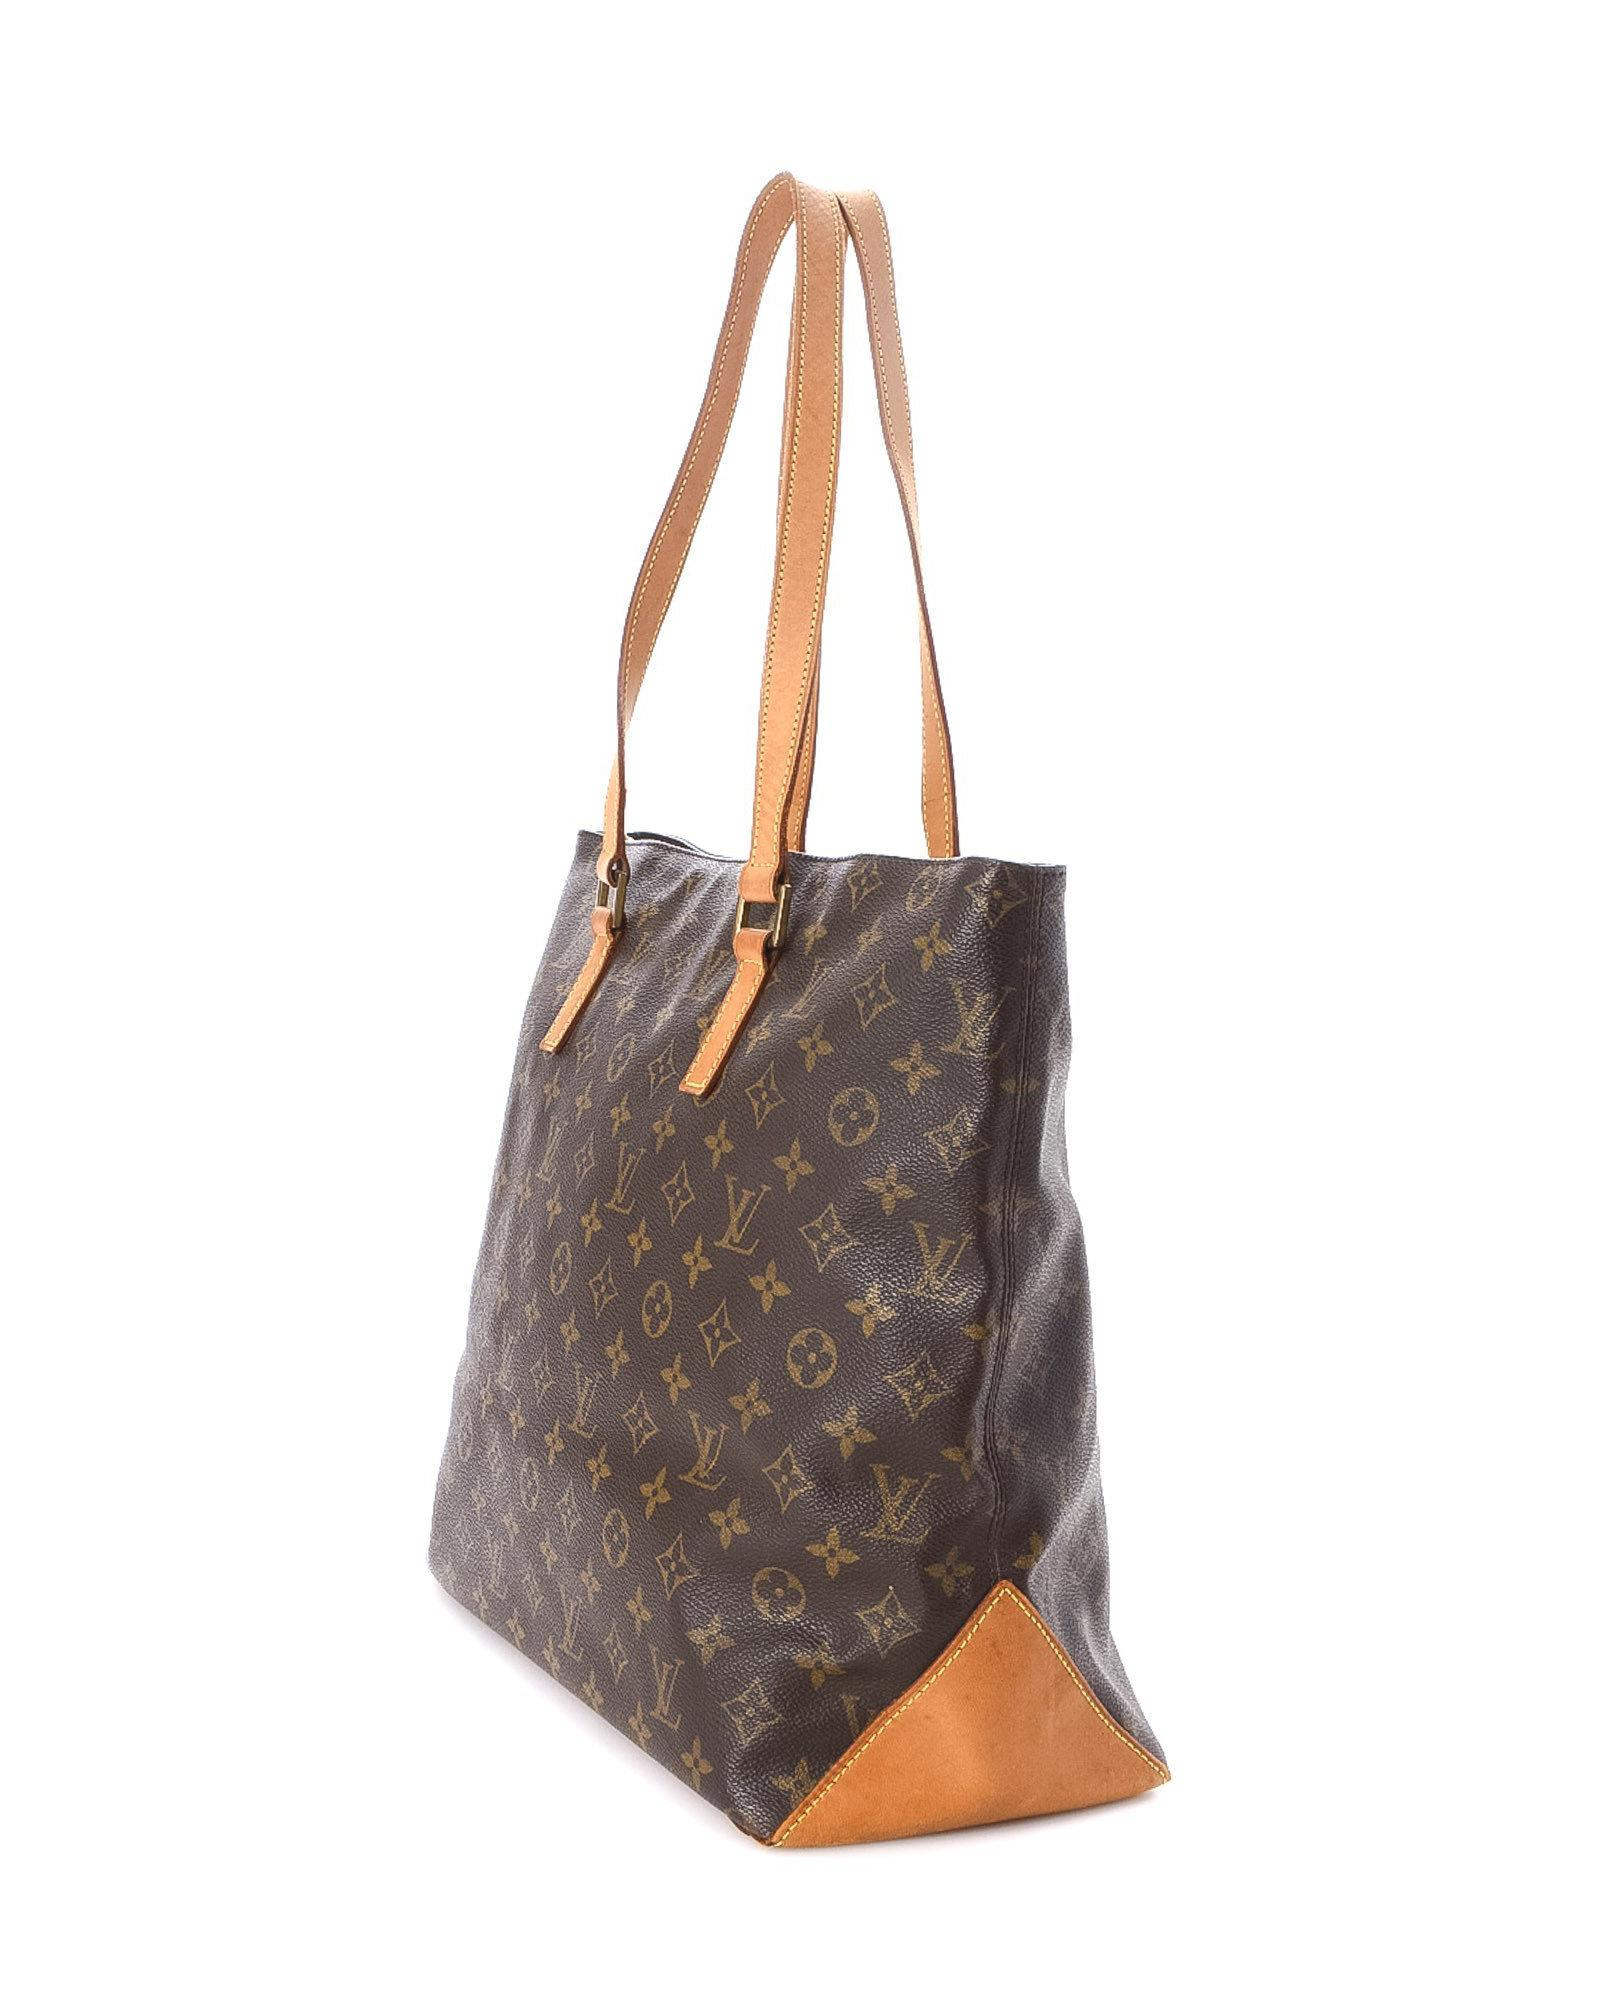 b25e3051c27c Lyst - Louis Vuitton Cabas Mezzo Tote Bag - Vintage in Brown